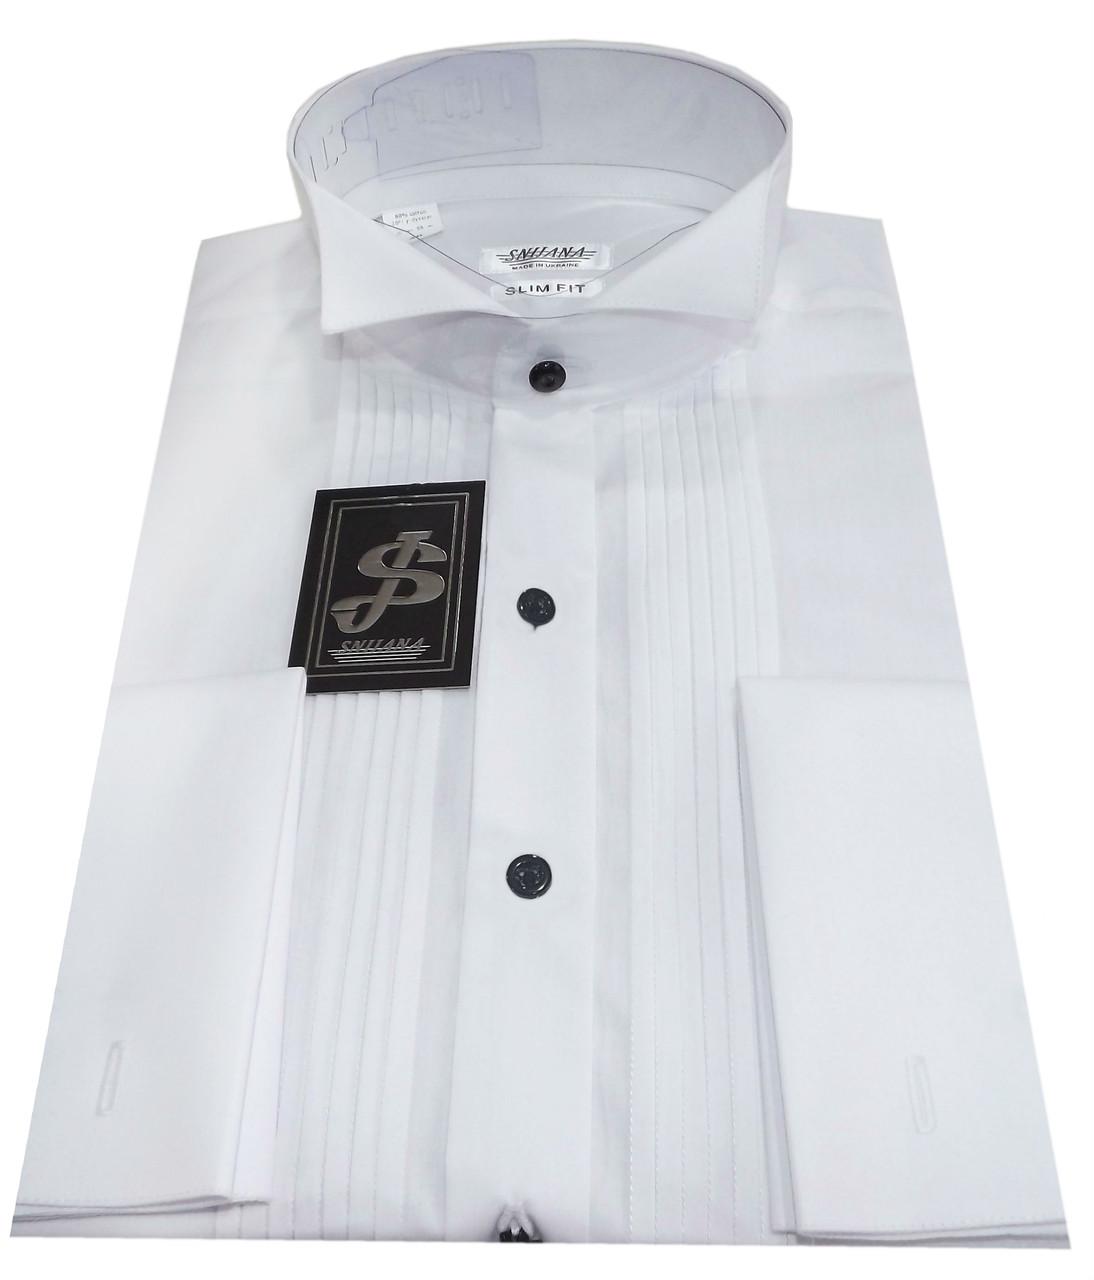 Рубашка мужская белая под бабочку